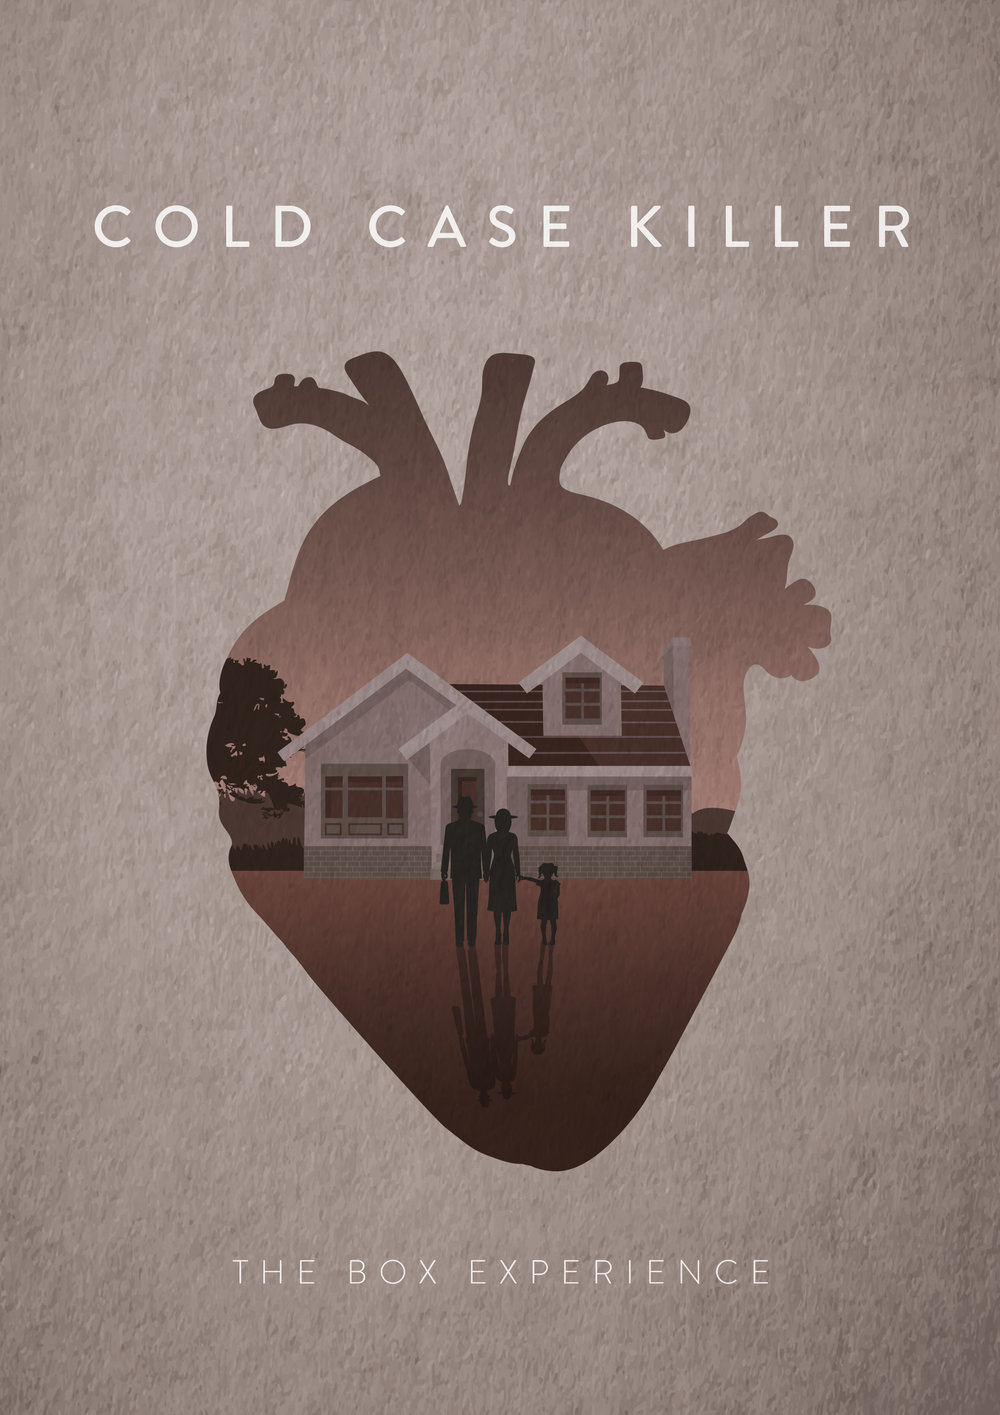 Cold_C_K Poster.jpg